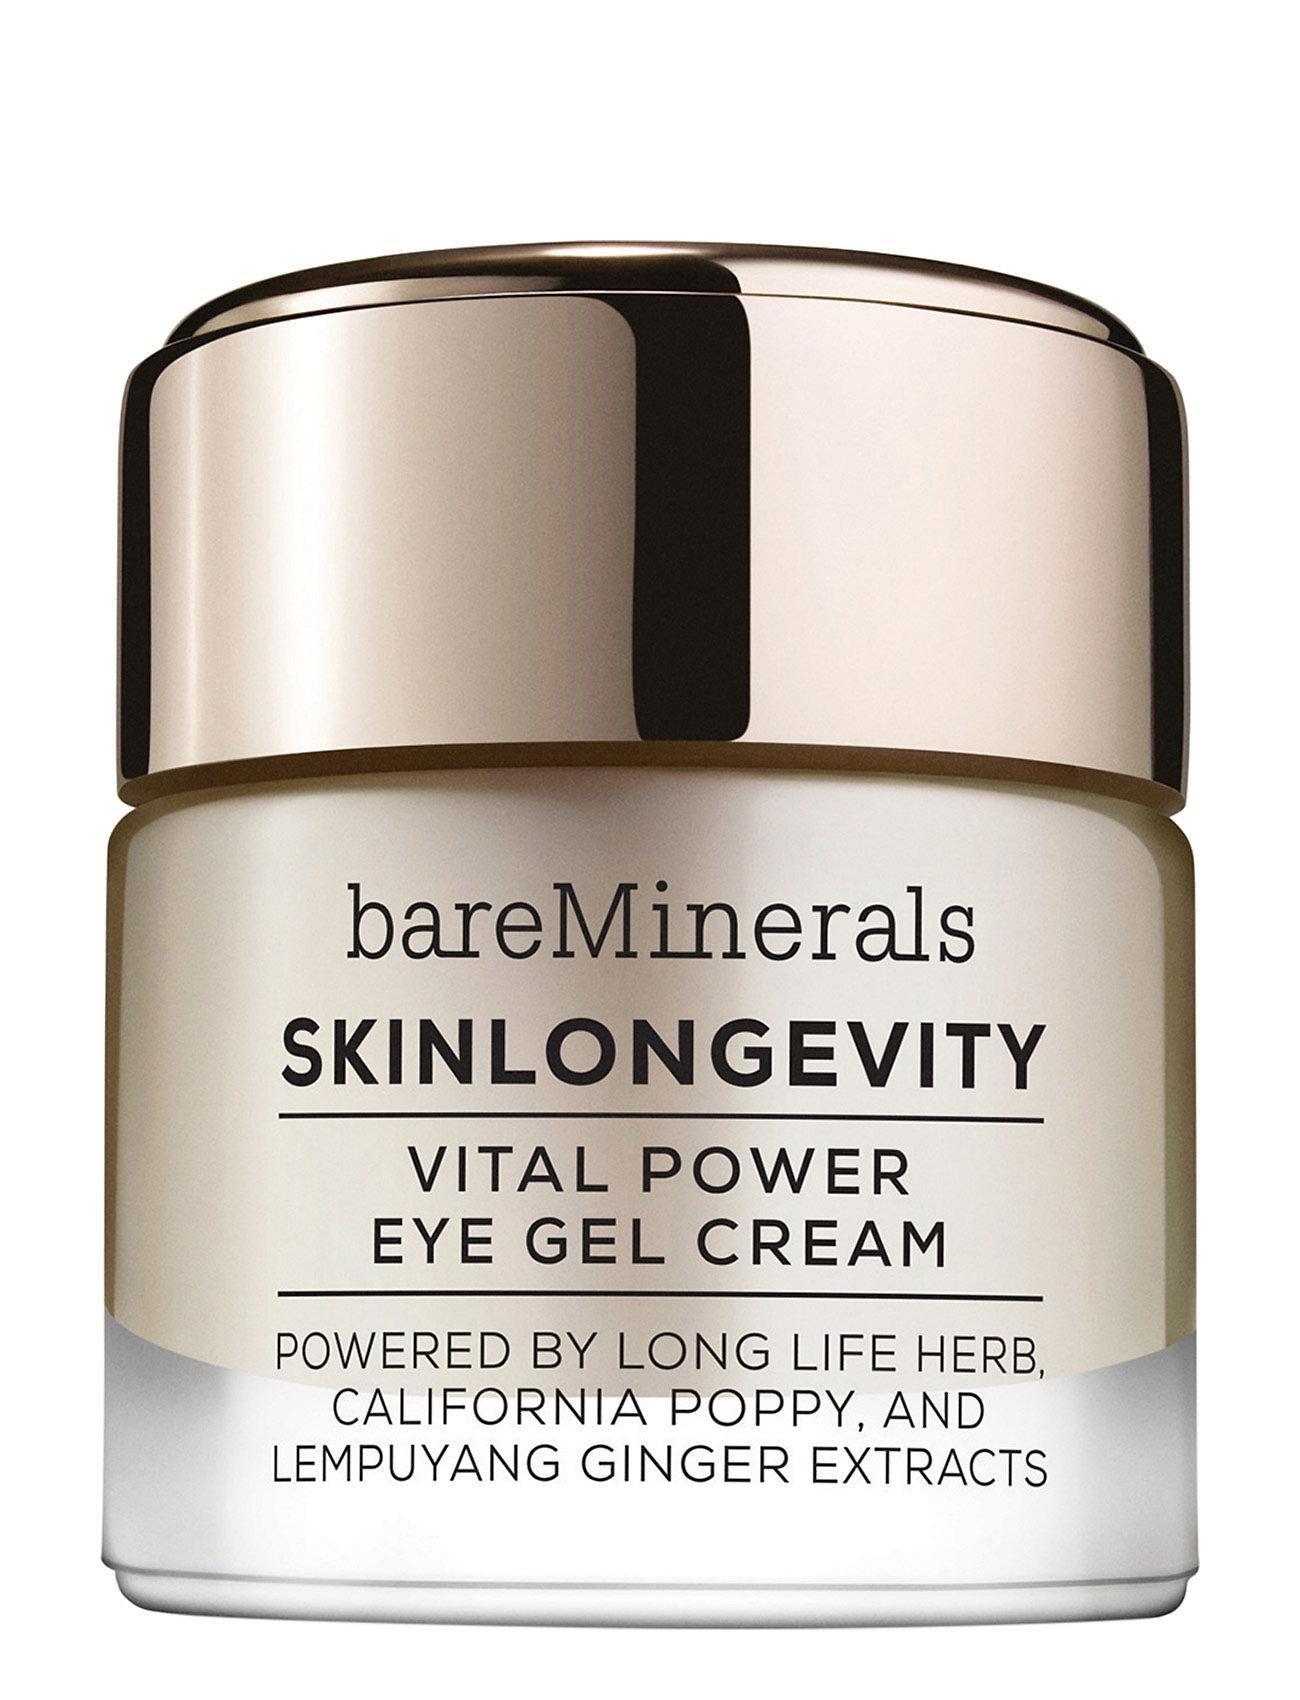 Image of Skinlongevity Vital Power Eye Cream Gel Beauty WOMEN Skin Care Face Eye Cream Nude BareMinerals (3267164069)